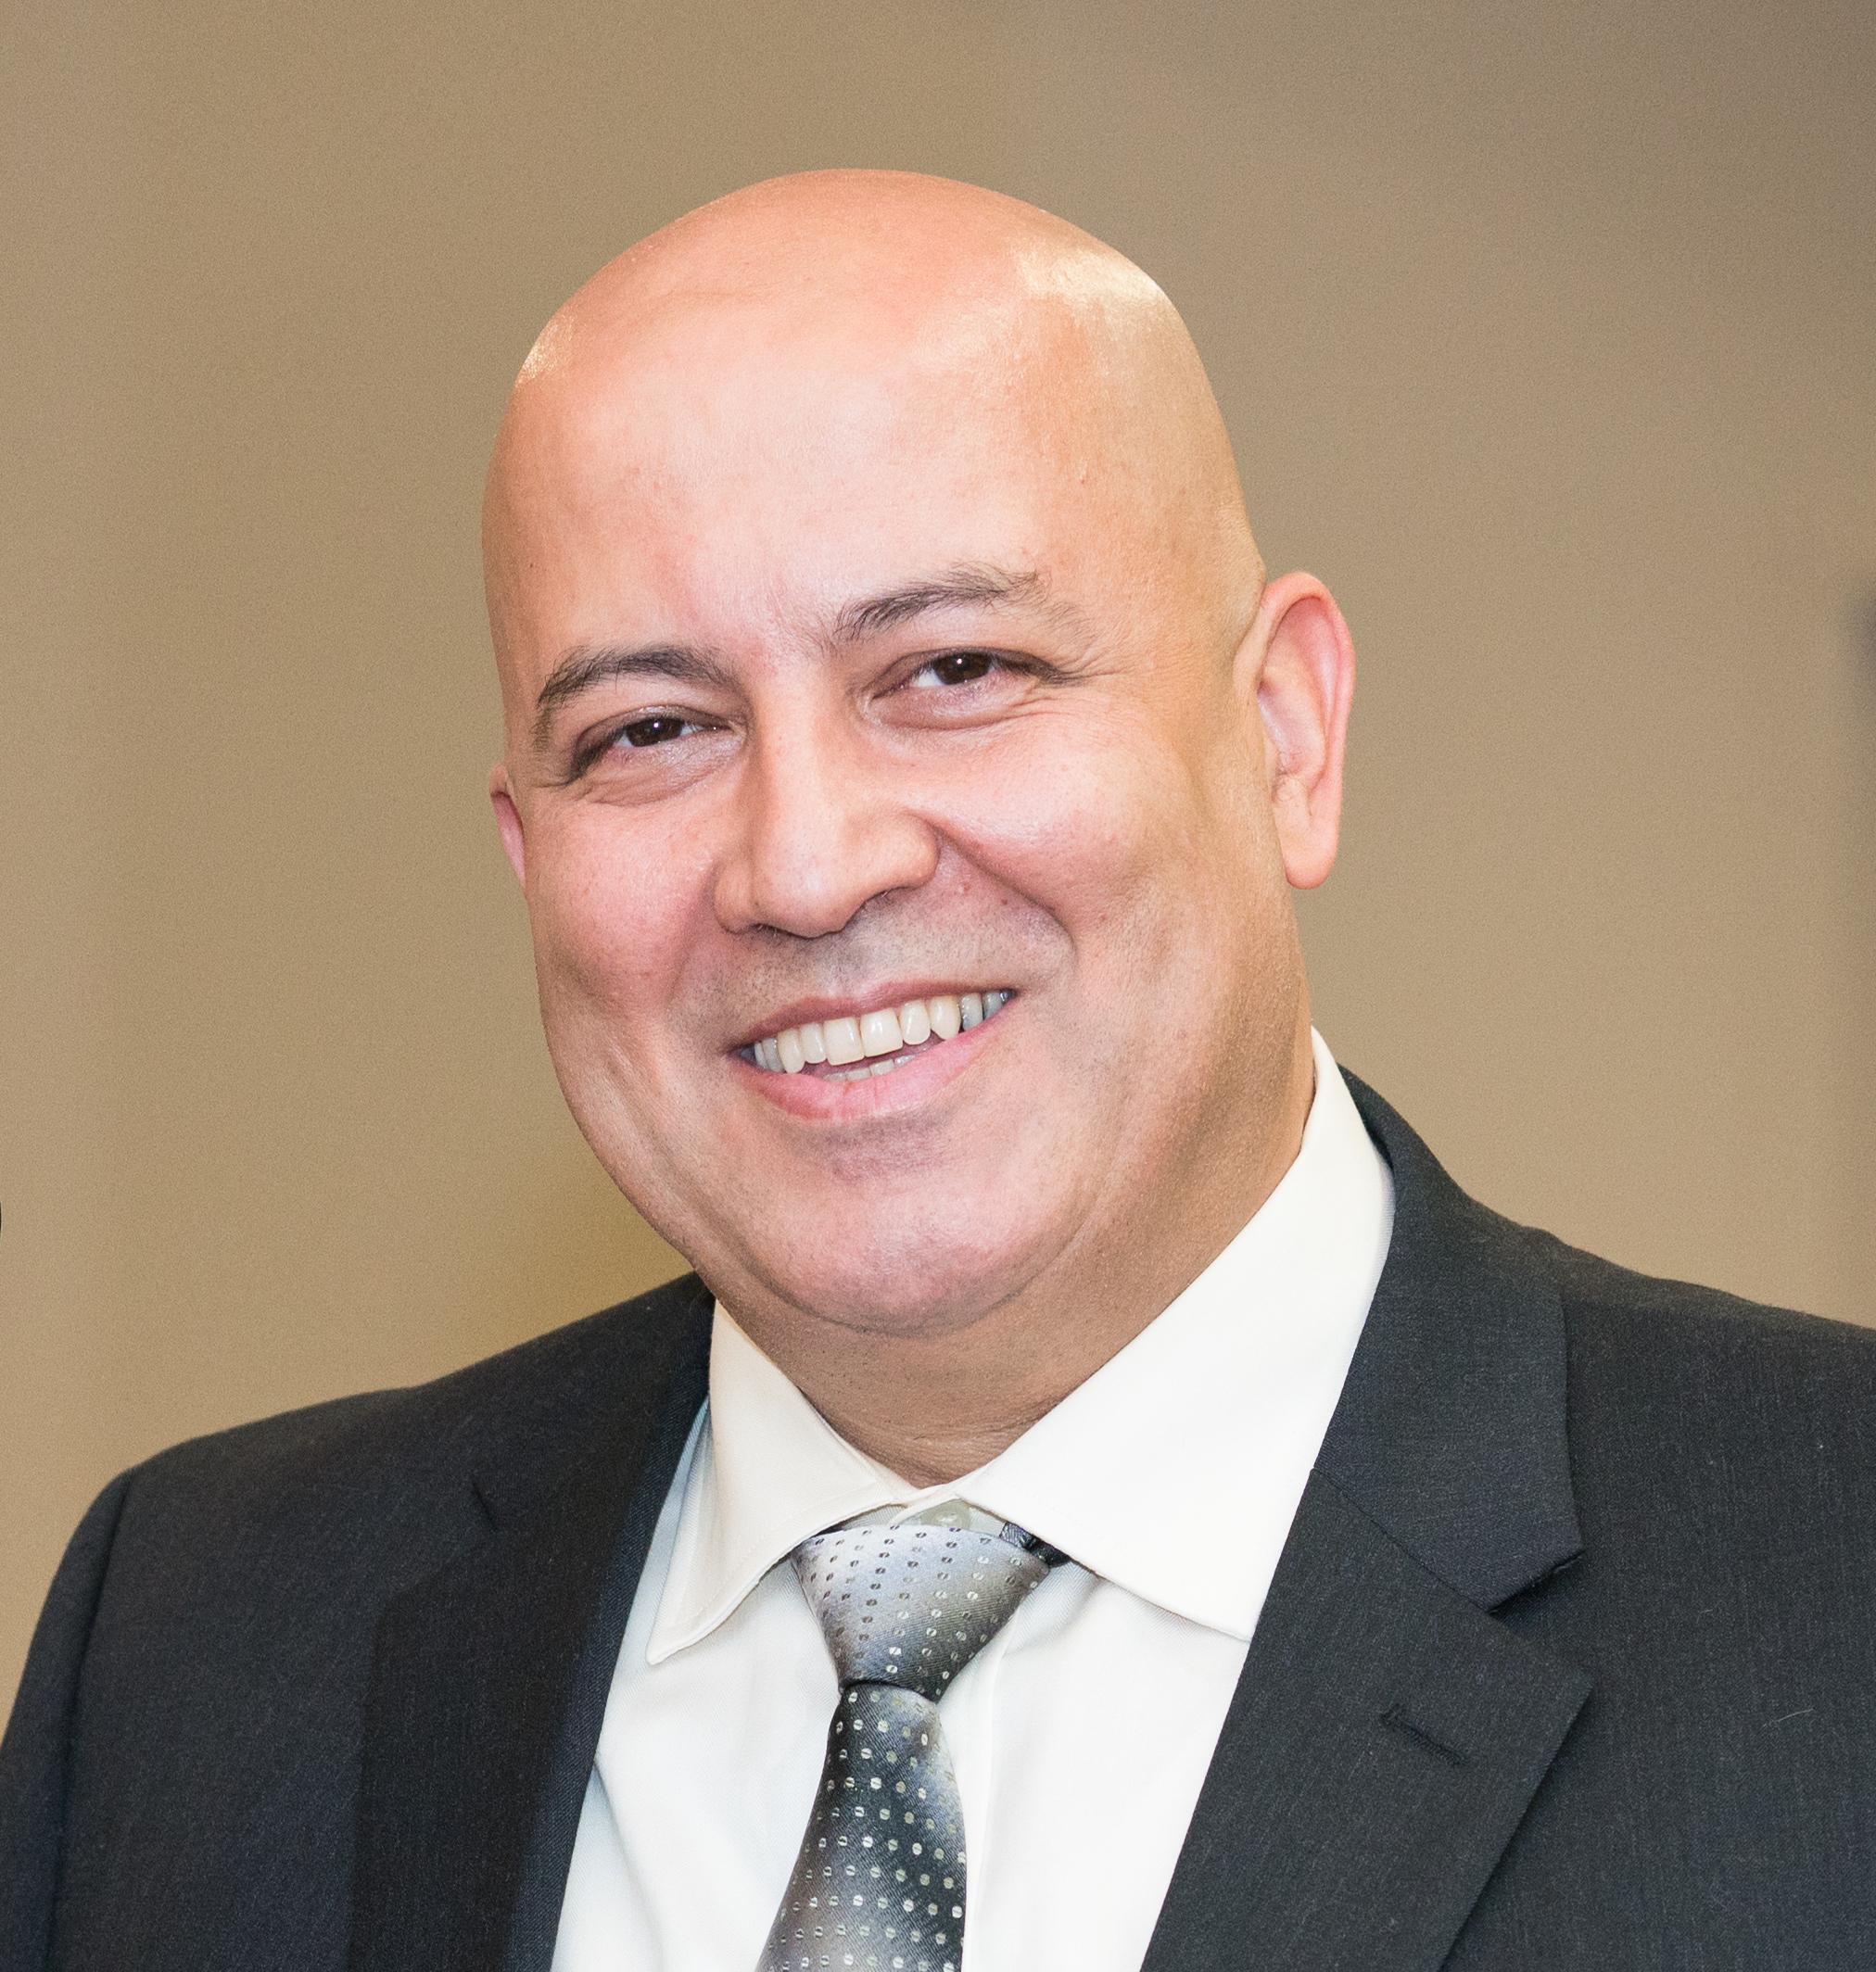 mazenhaddad2016